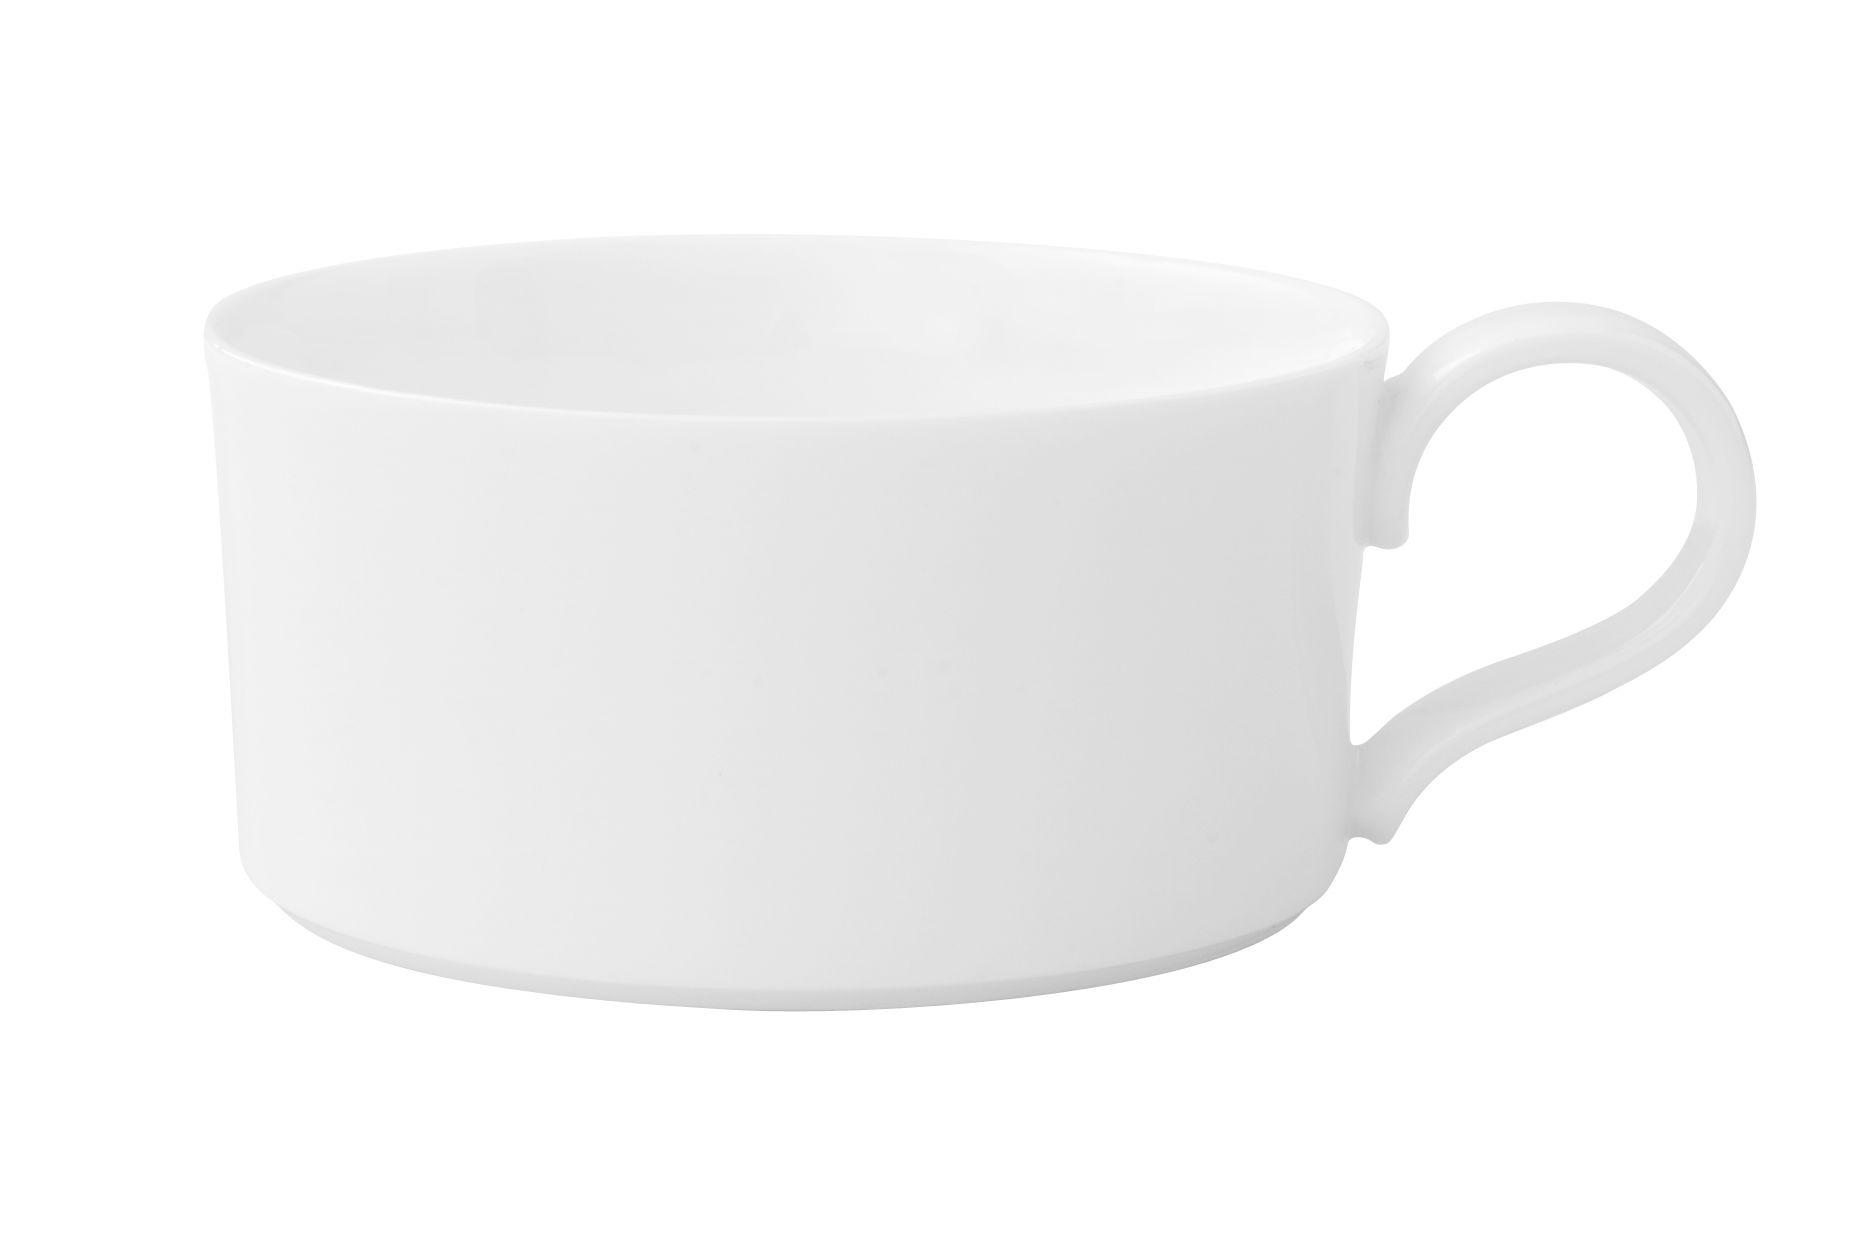 Villeroy & Boch Modern Grace Teacup 0.23l thumb 1